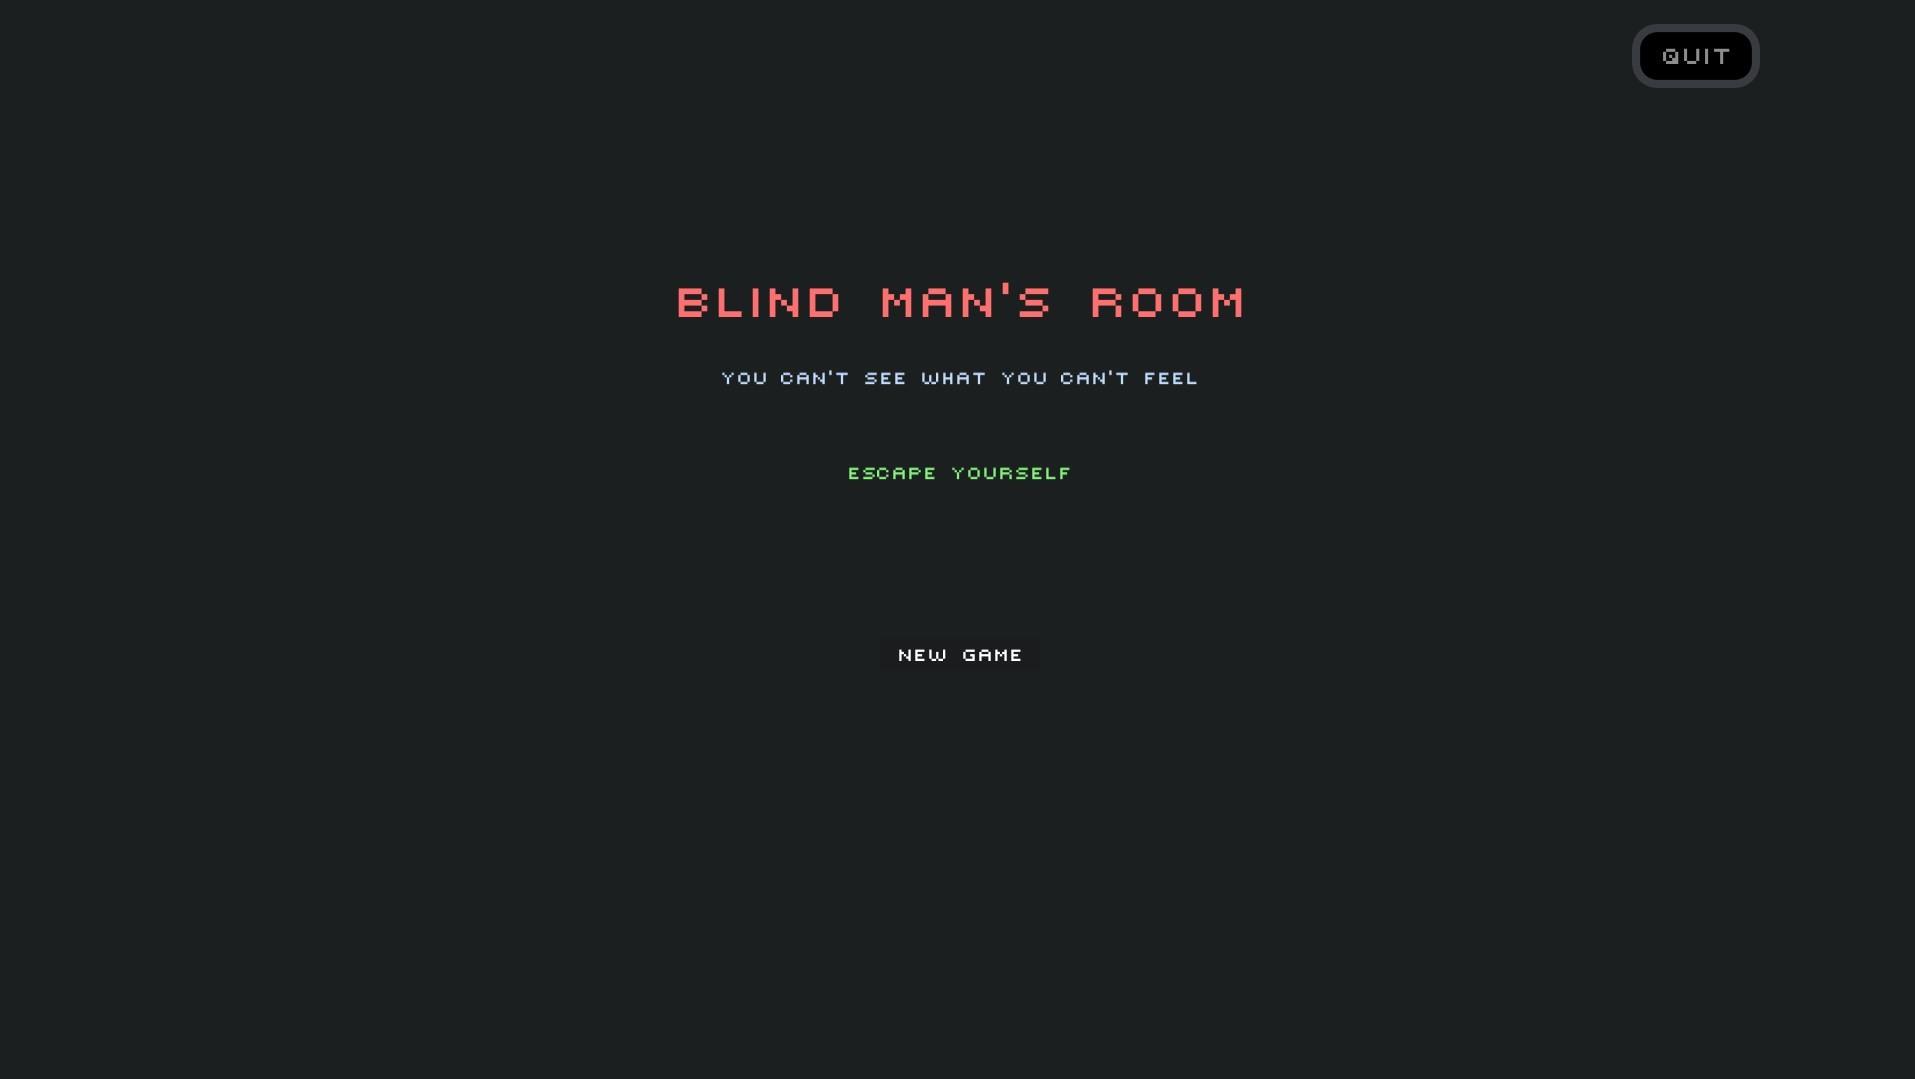 Blind Man's Room